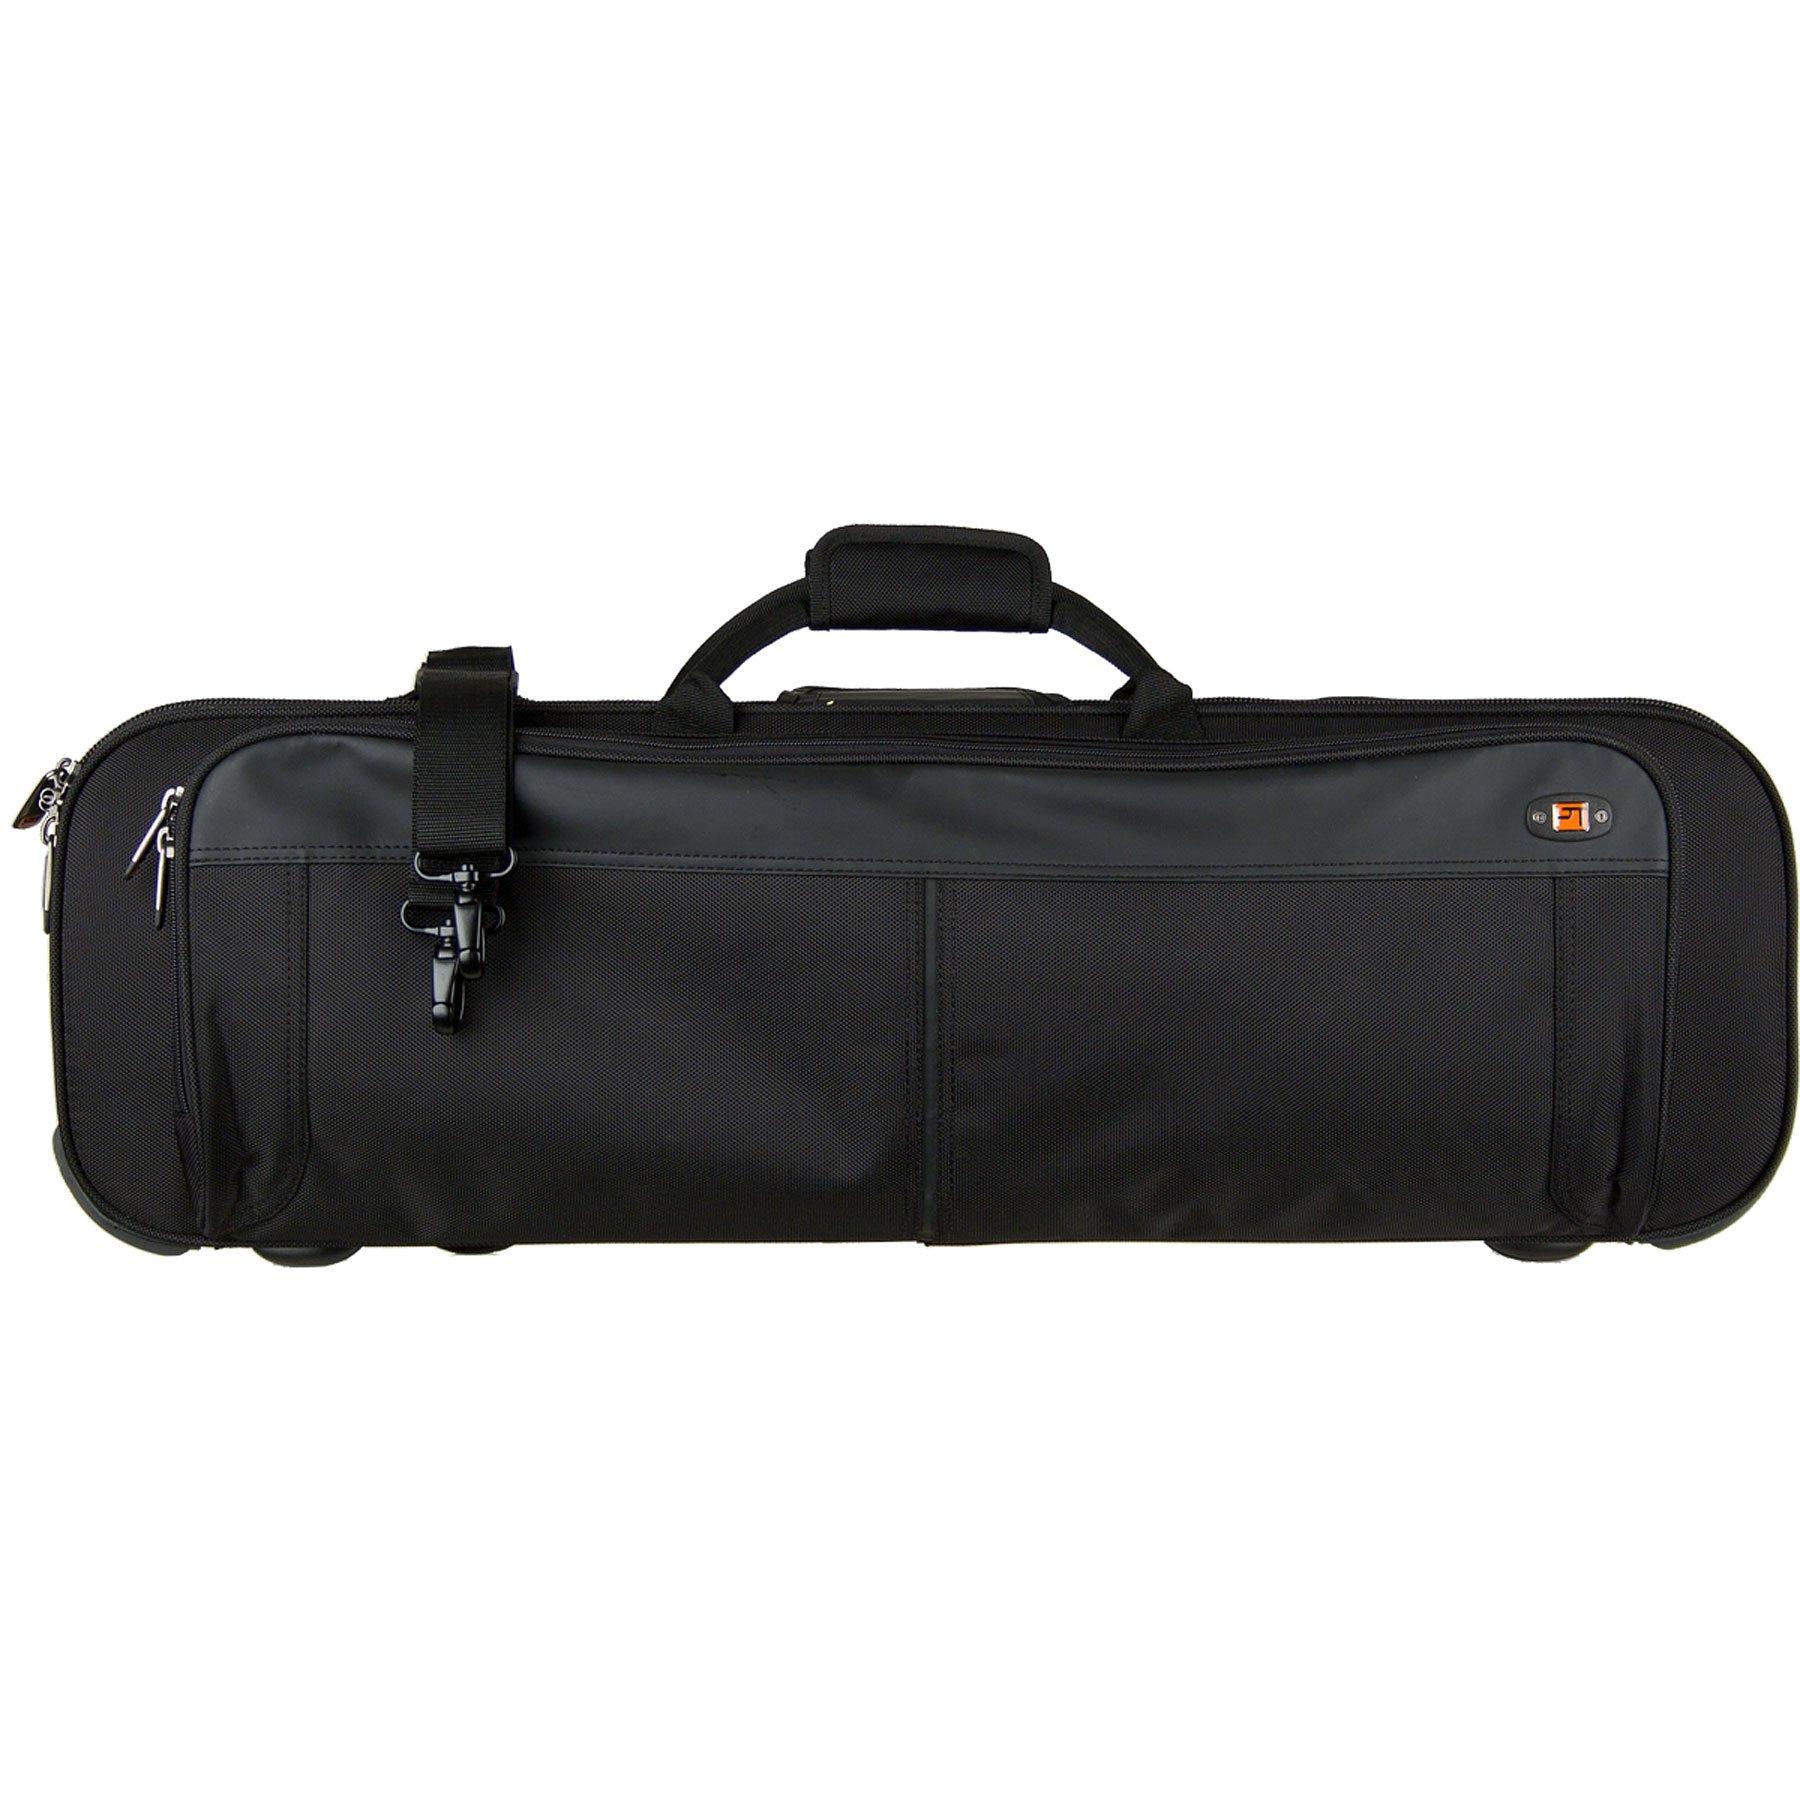 Protec Deluxe 4/4 Violin PRO PAC Case - Black Interior by ProTec (Image #1)